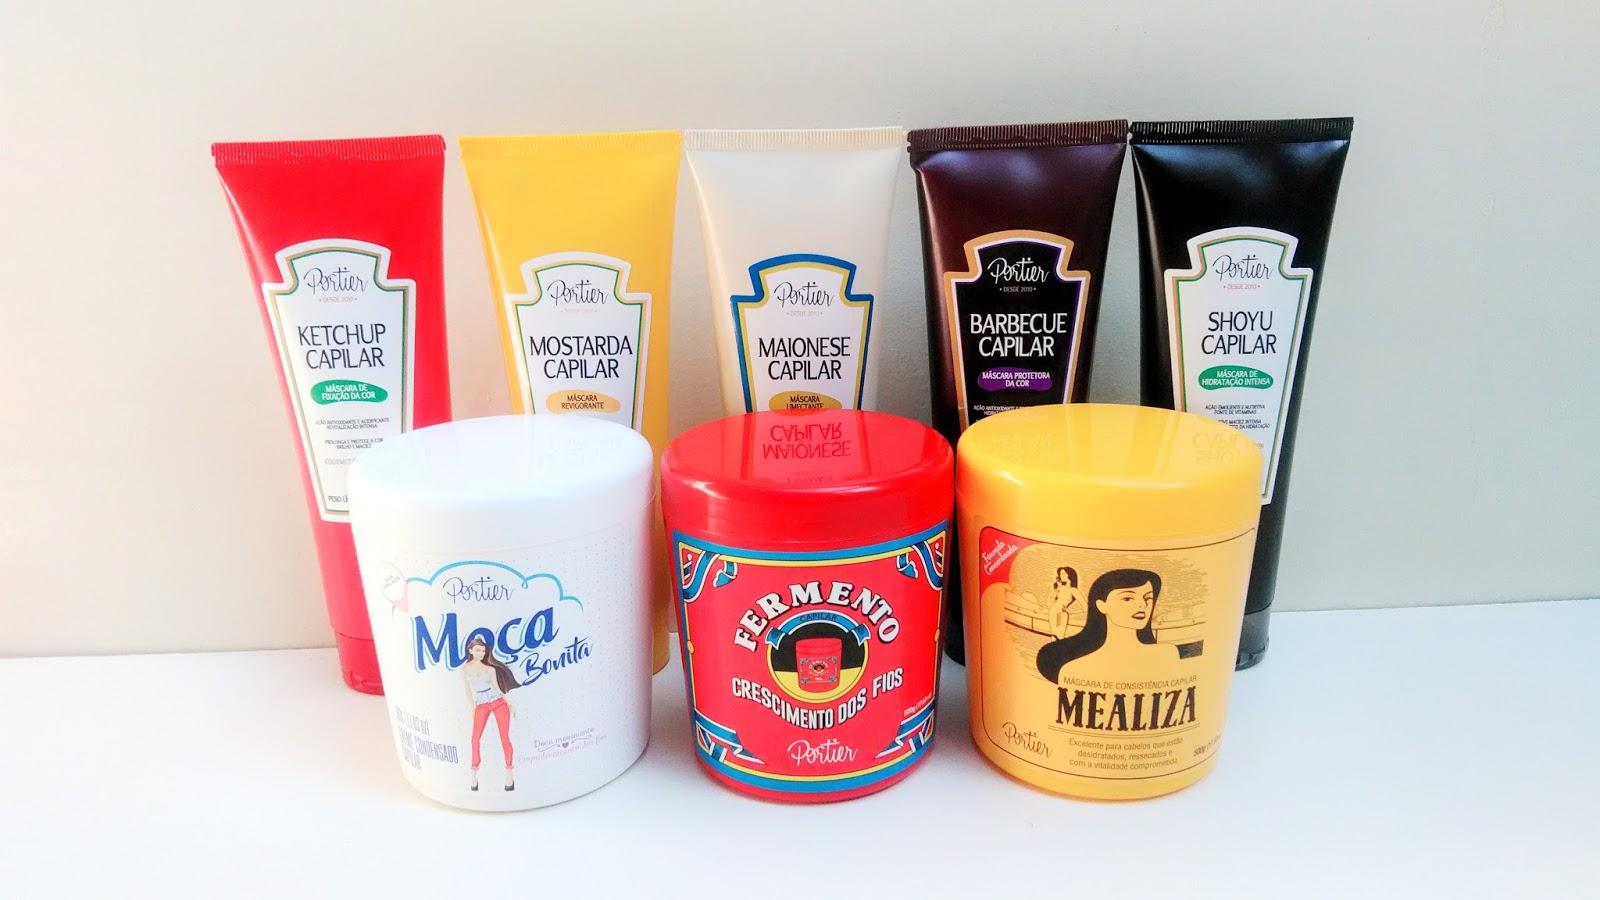 portier linha gourmet collection